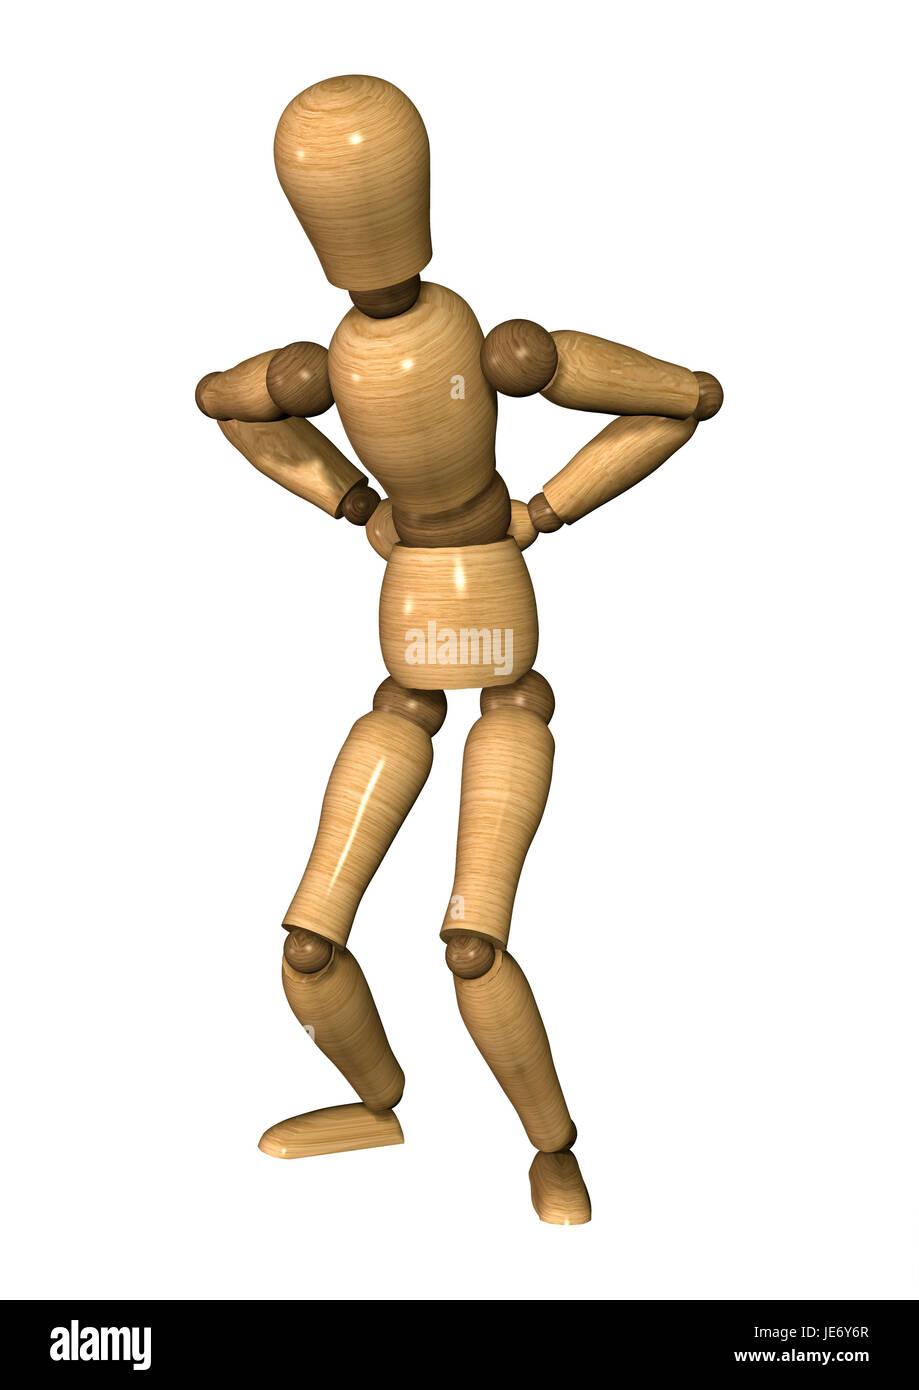 Manikin, position, back pains, - Stock Image